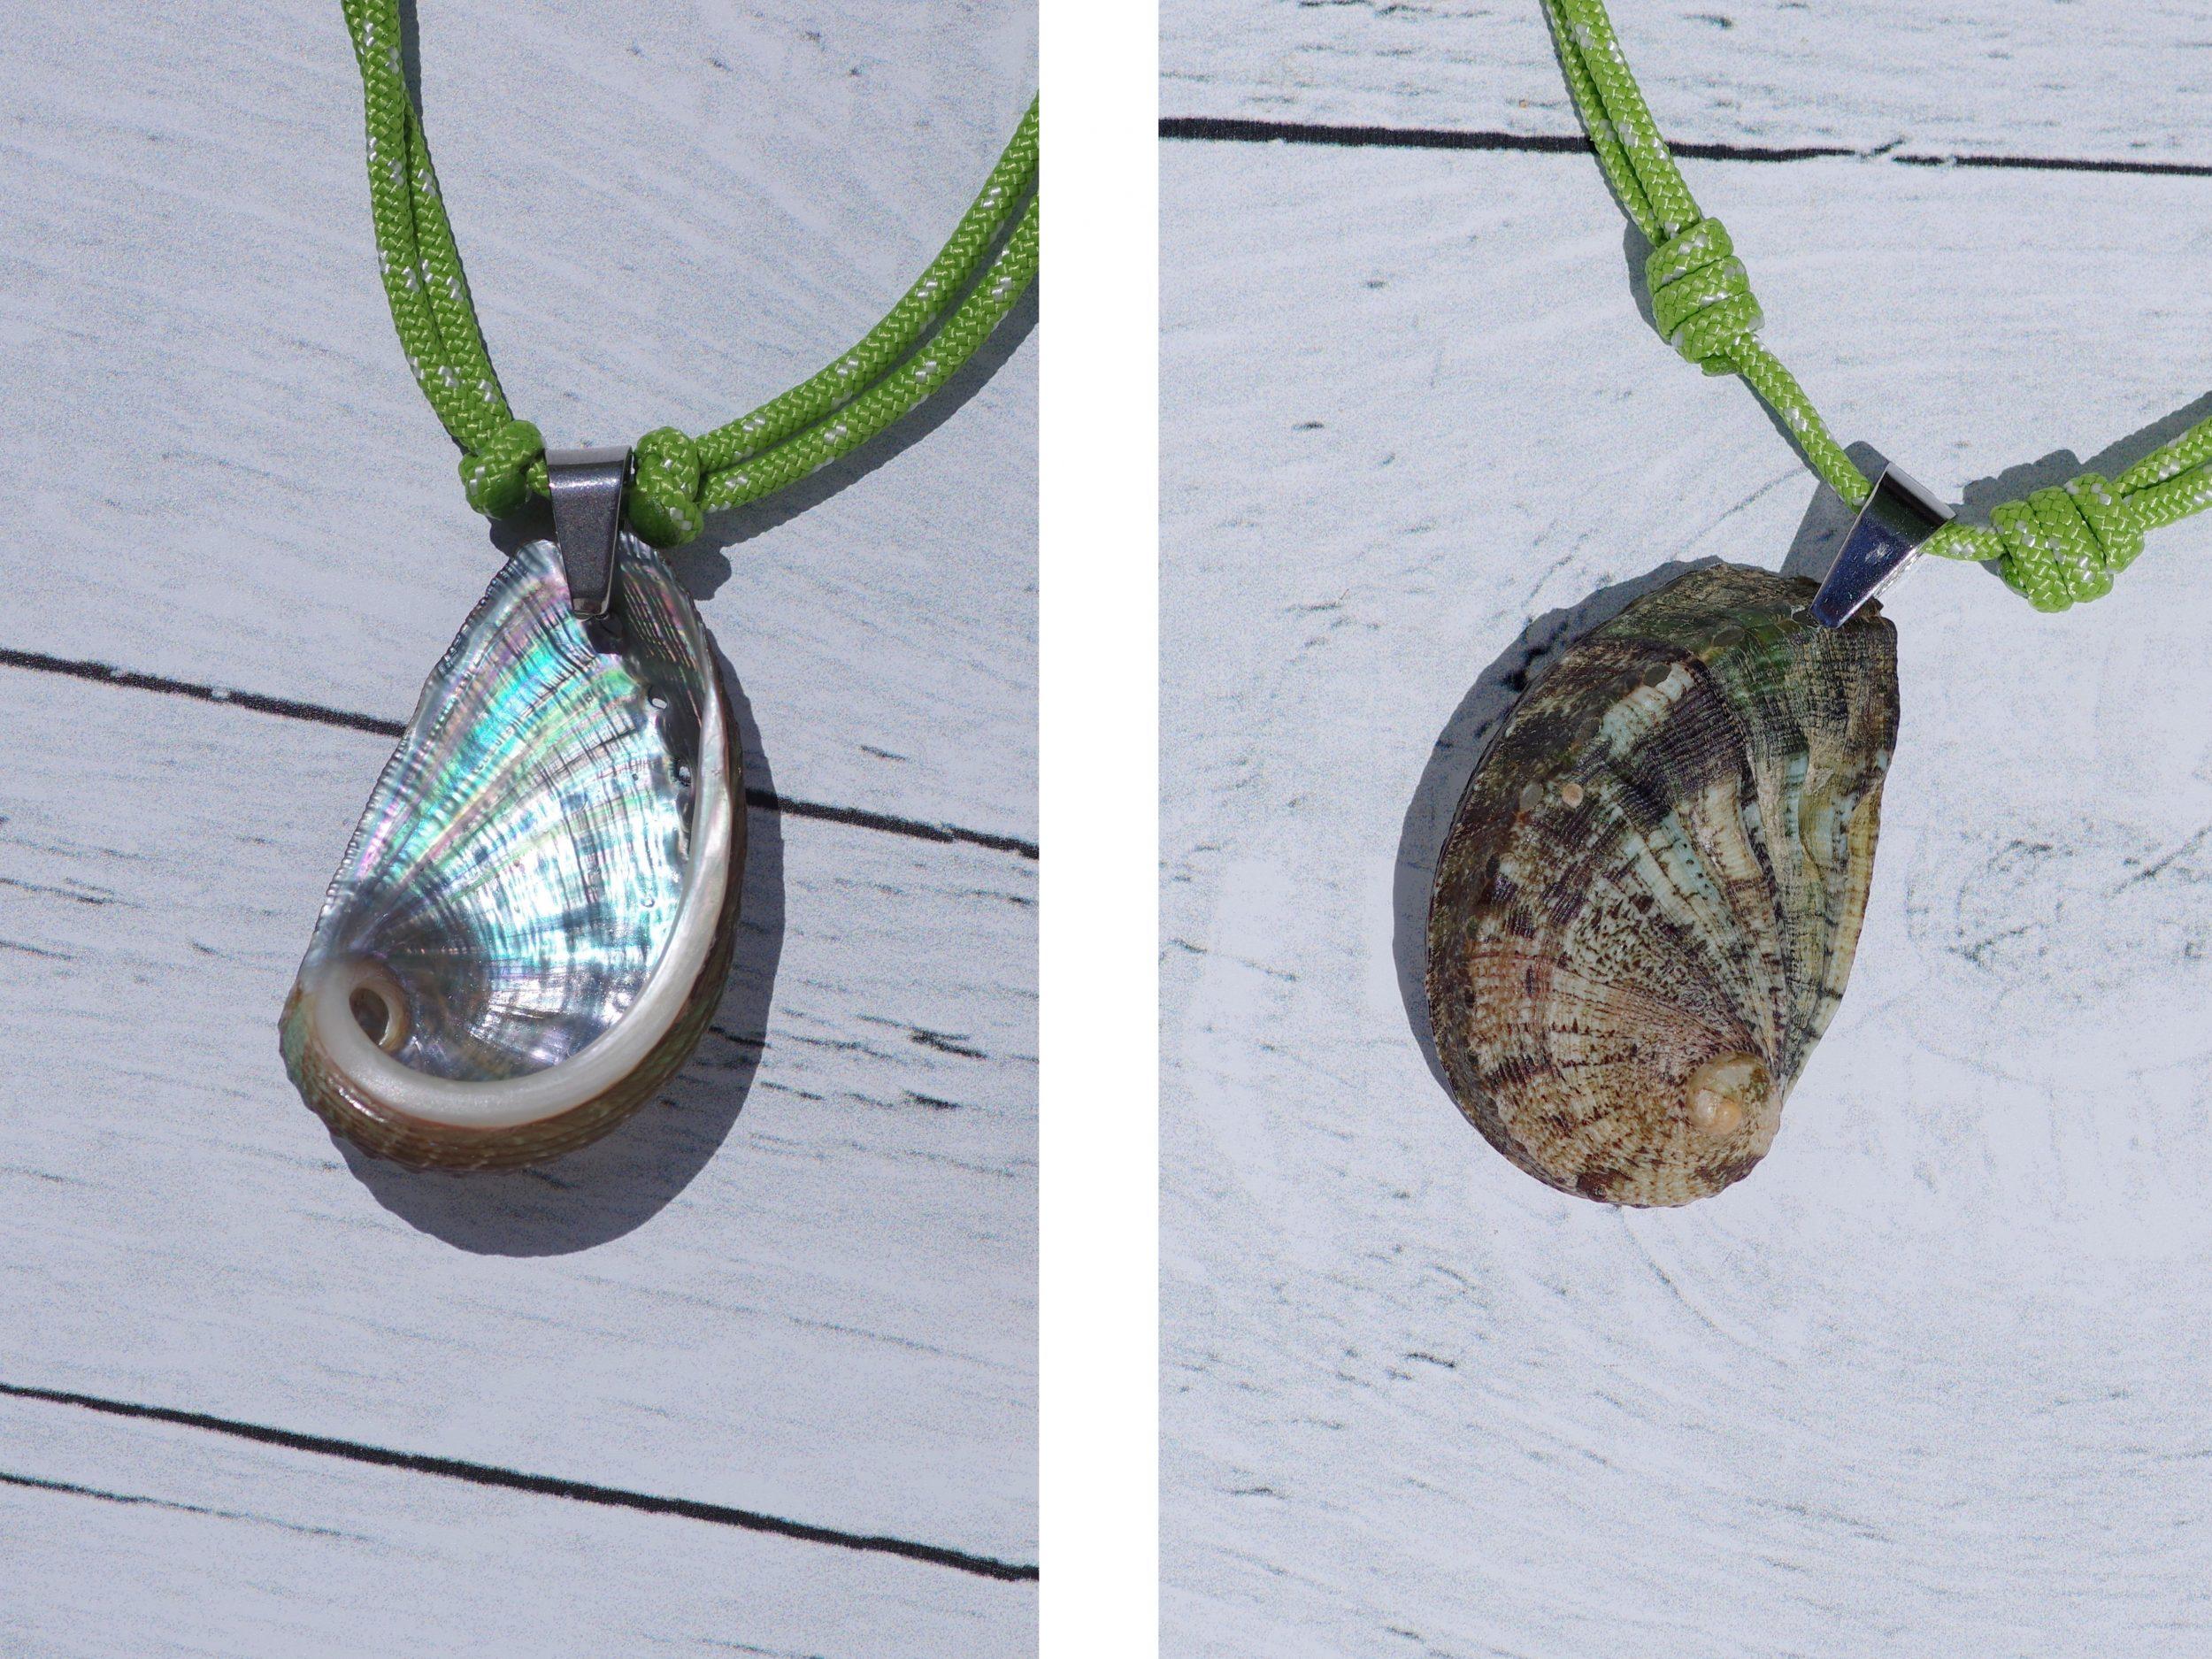 pendentif coquillage ormeau sur cordelette marine verte, à porter recto ( brun-vert ) ou verso (nacre très brillante)